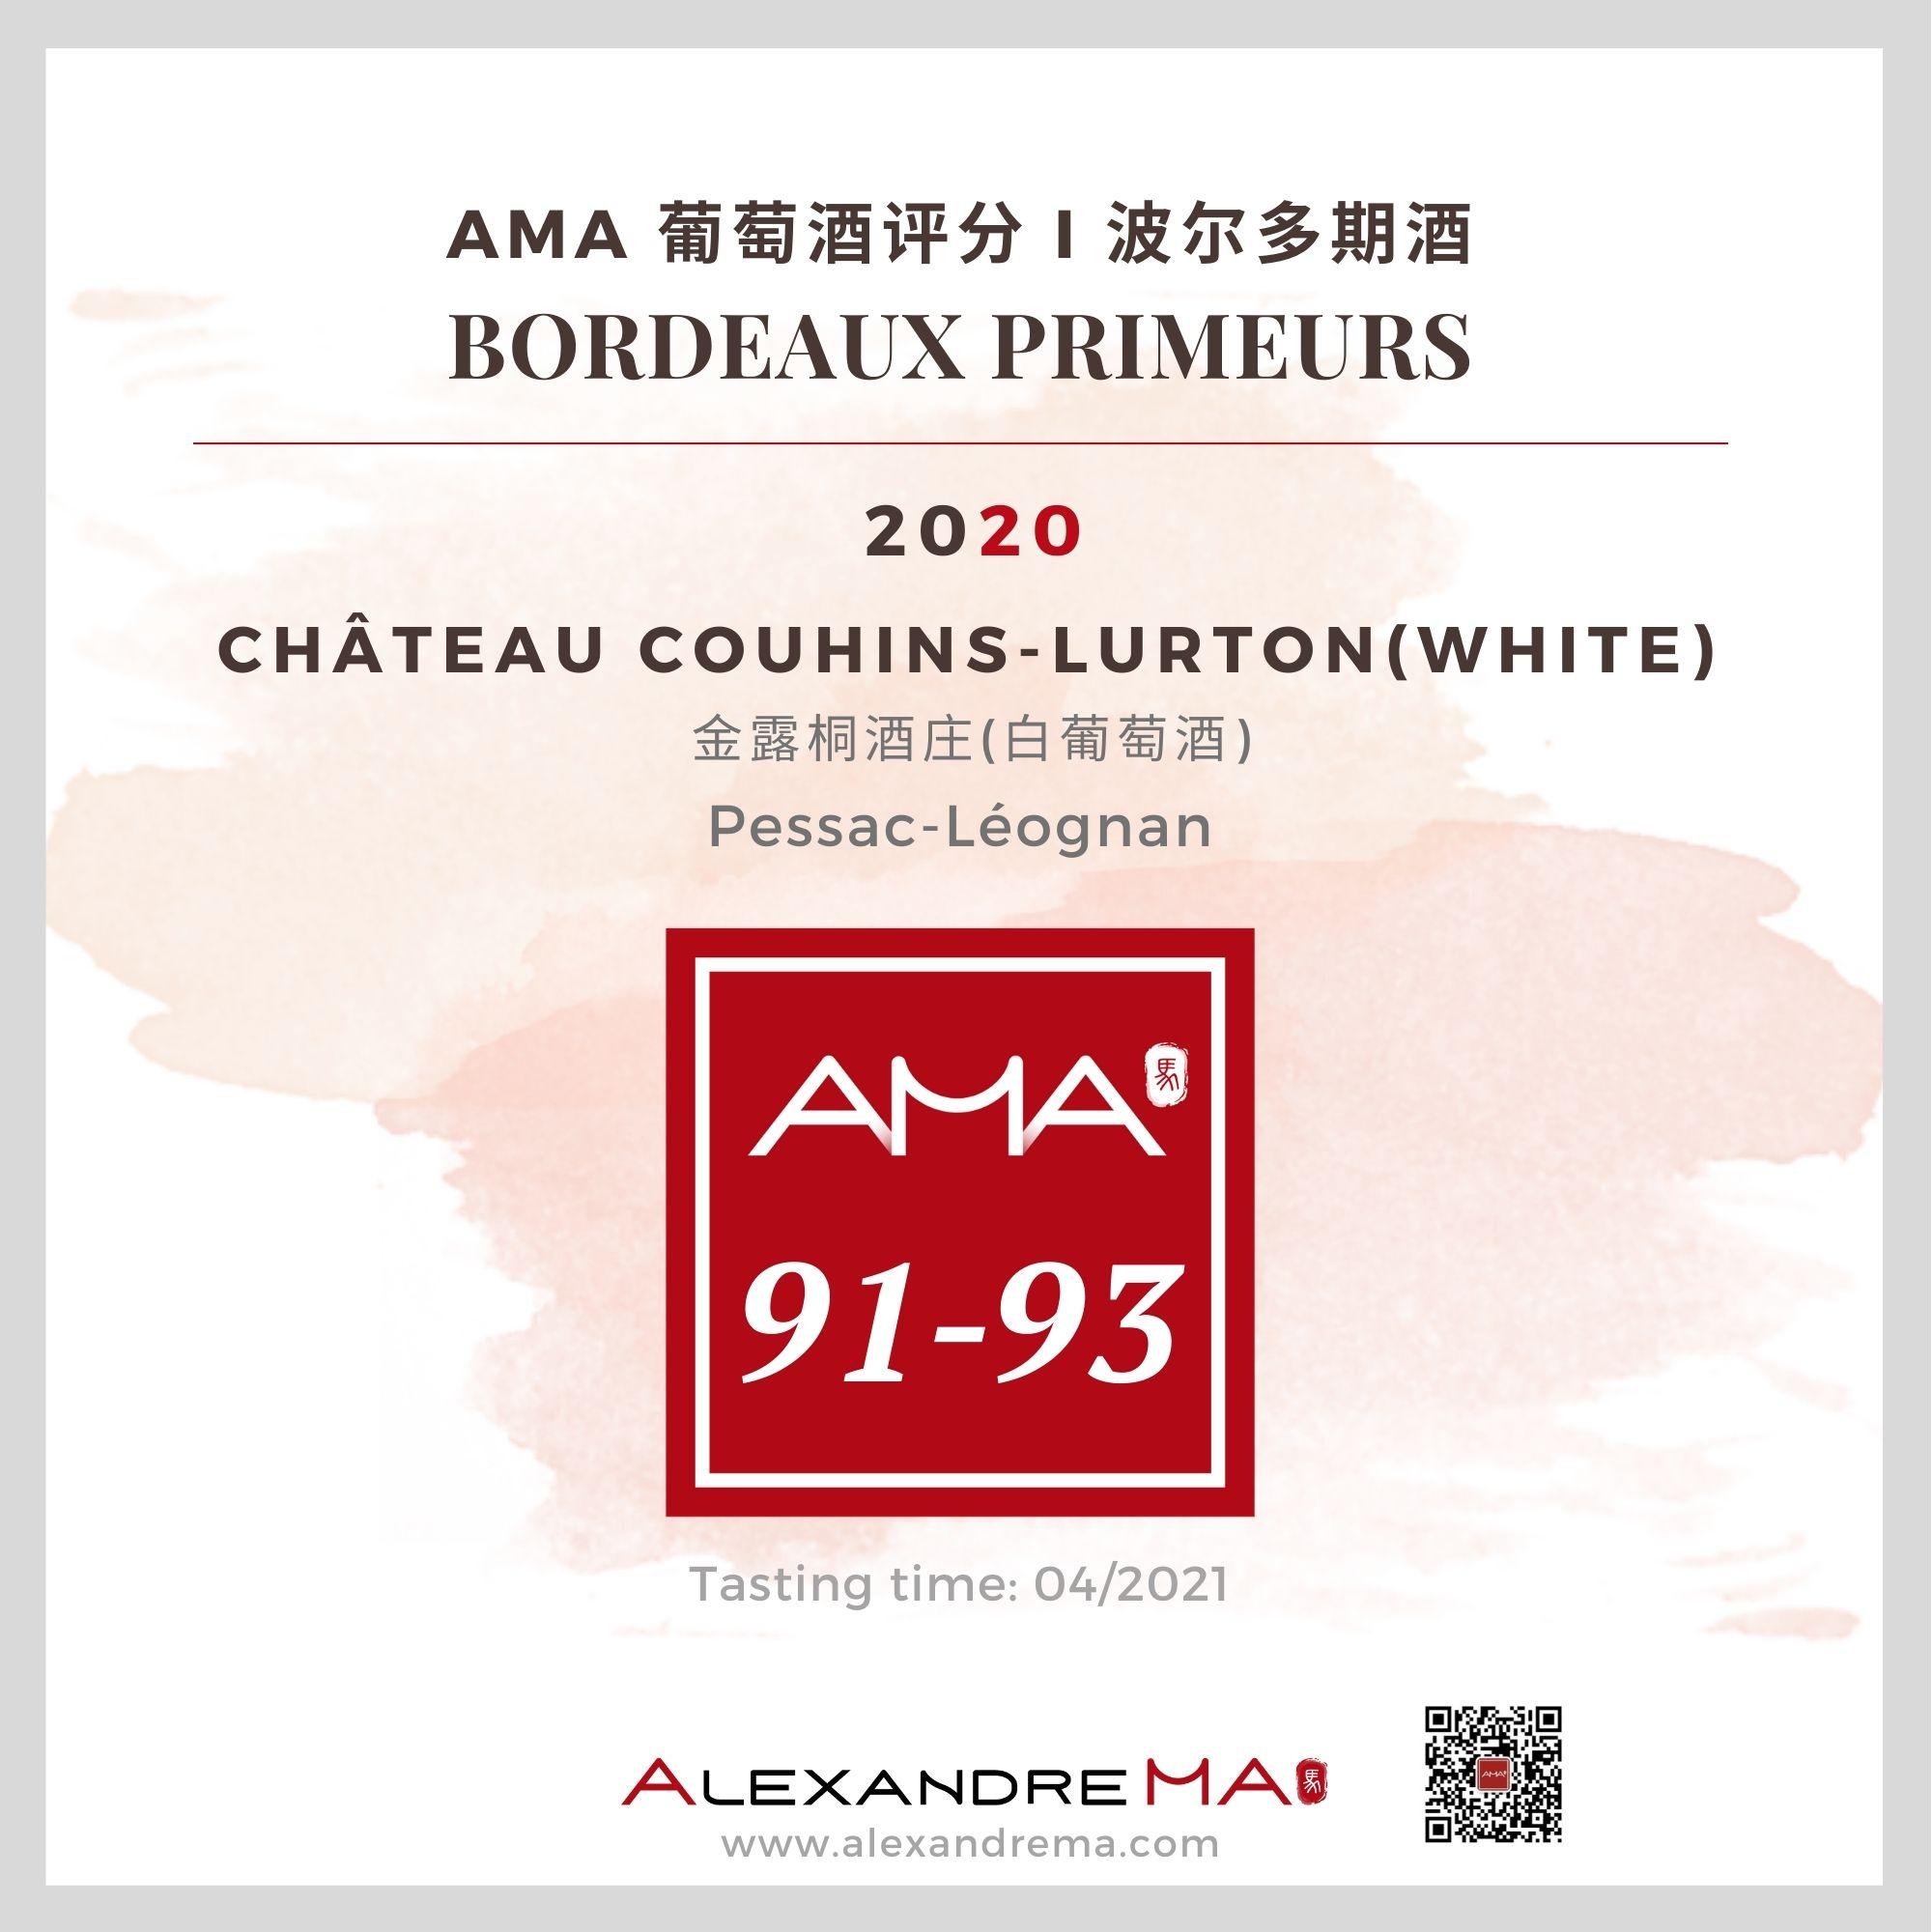 Château Couhins-Lurton 2020 金露桐酒庄 - Alexandre Ma